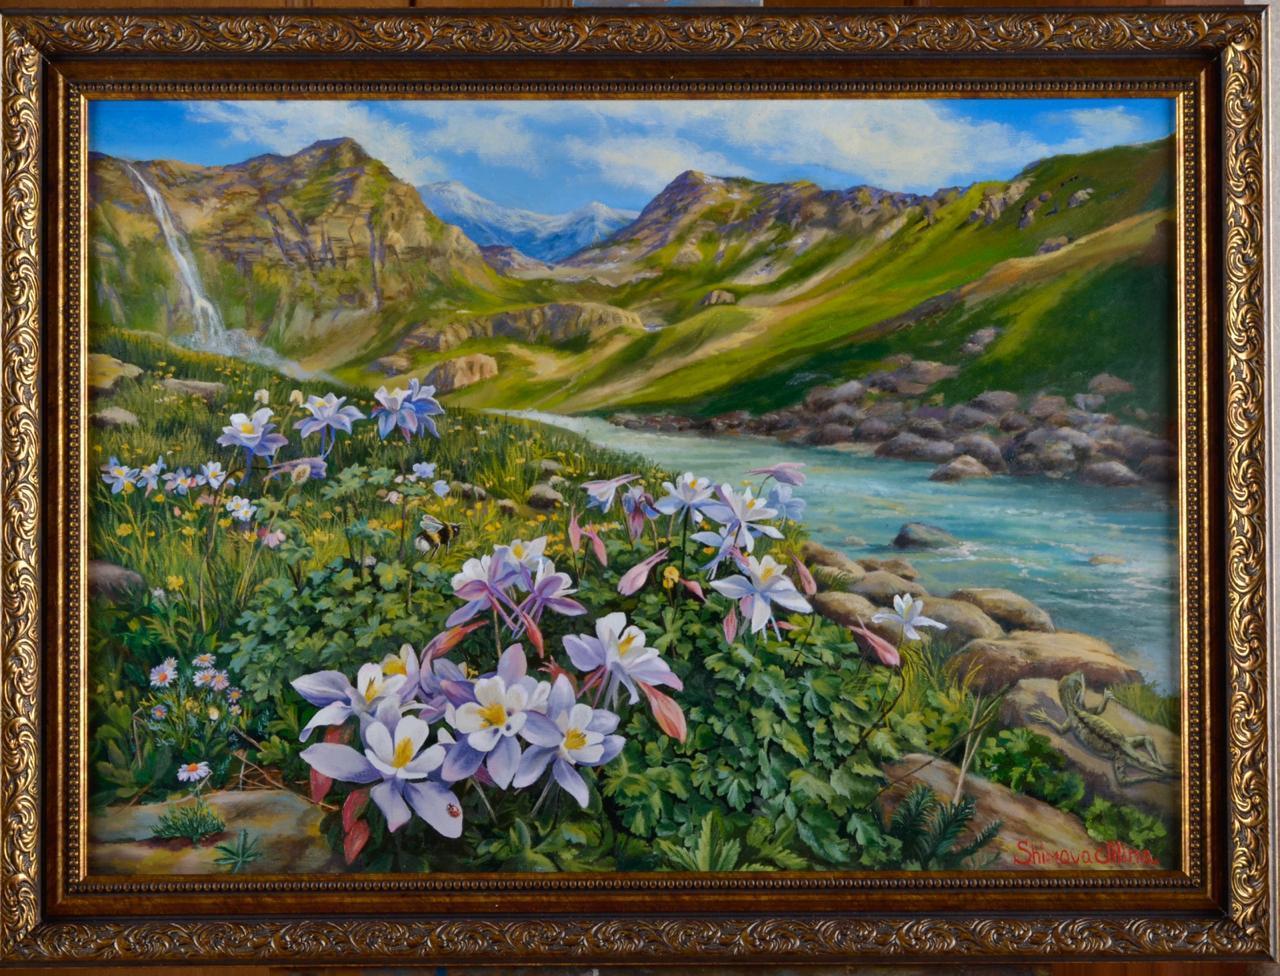 """Bumblebee"" Oil painting 20 x 32 inch by Alina Shimova"